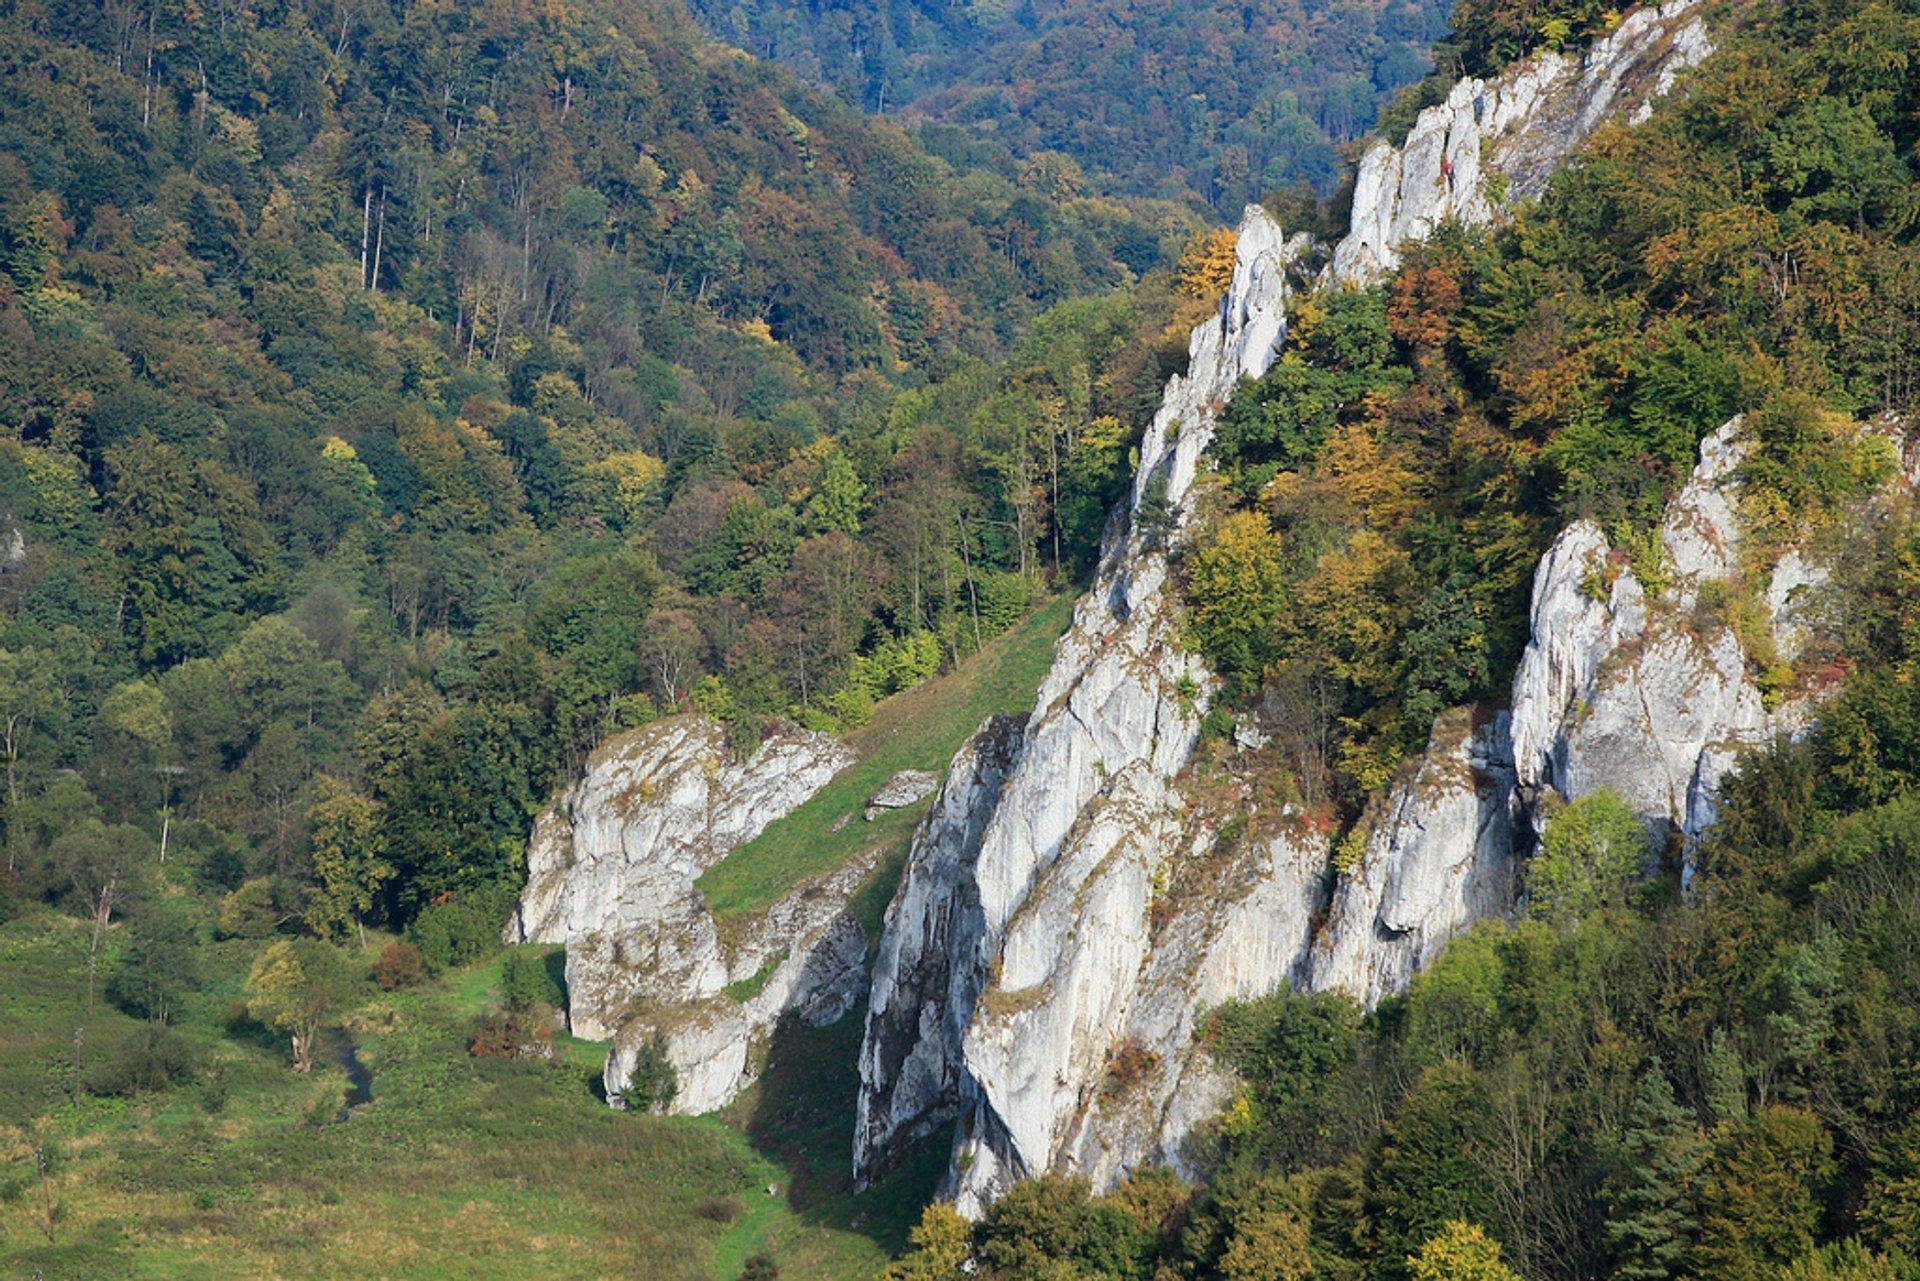 Hiking in Ojców National Park in Krakow - Best Time